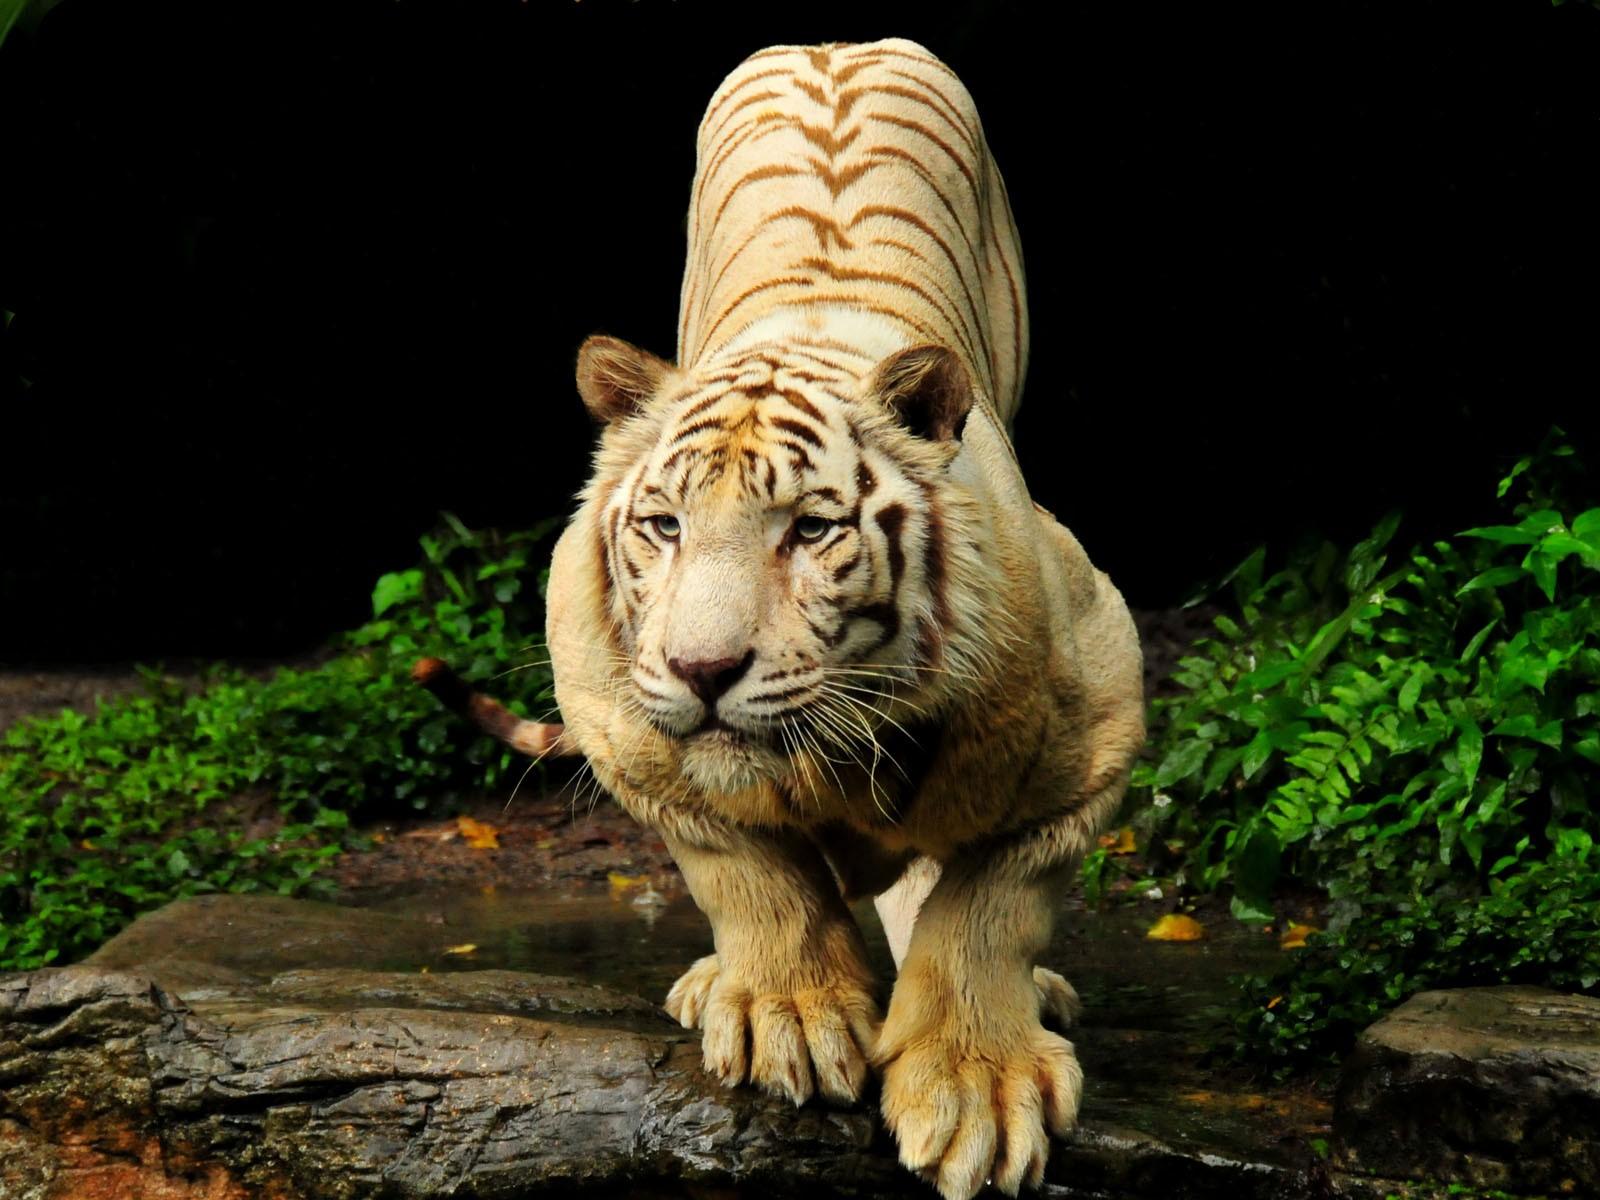 Beautiful Tiger Hd Desktop Wallpaper Fullscreen 1600x1200